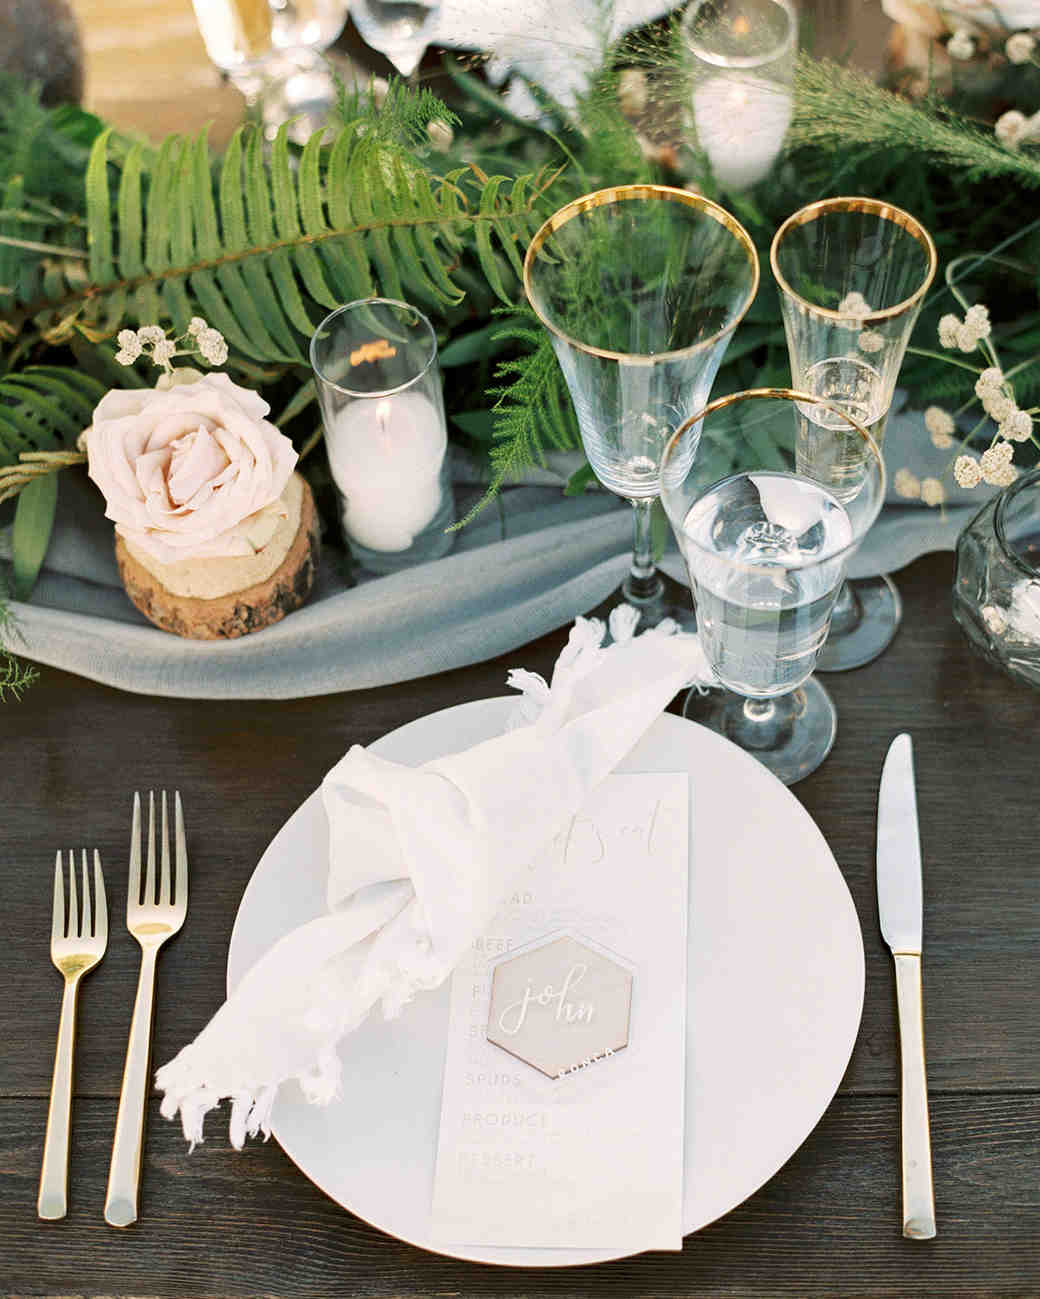 jena donny wedding placesetting tablescape centerpieces